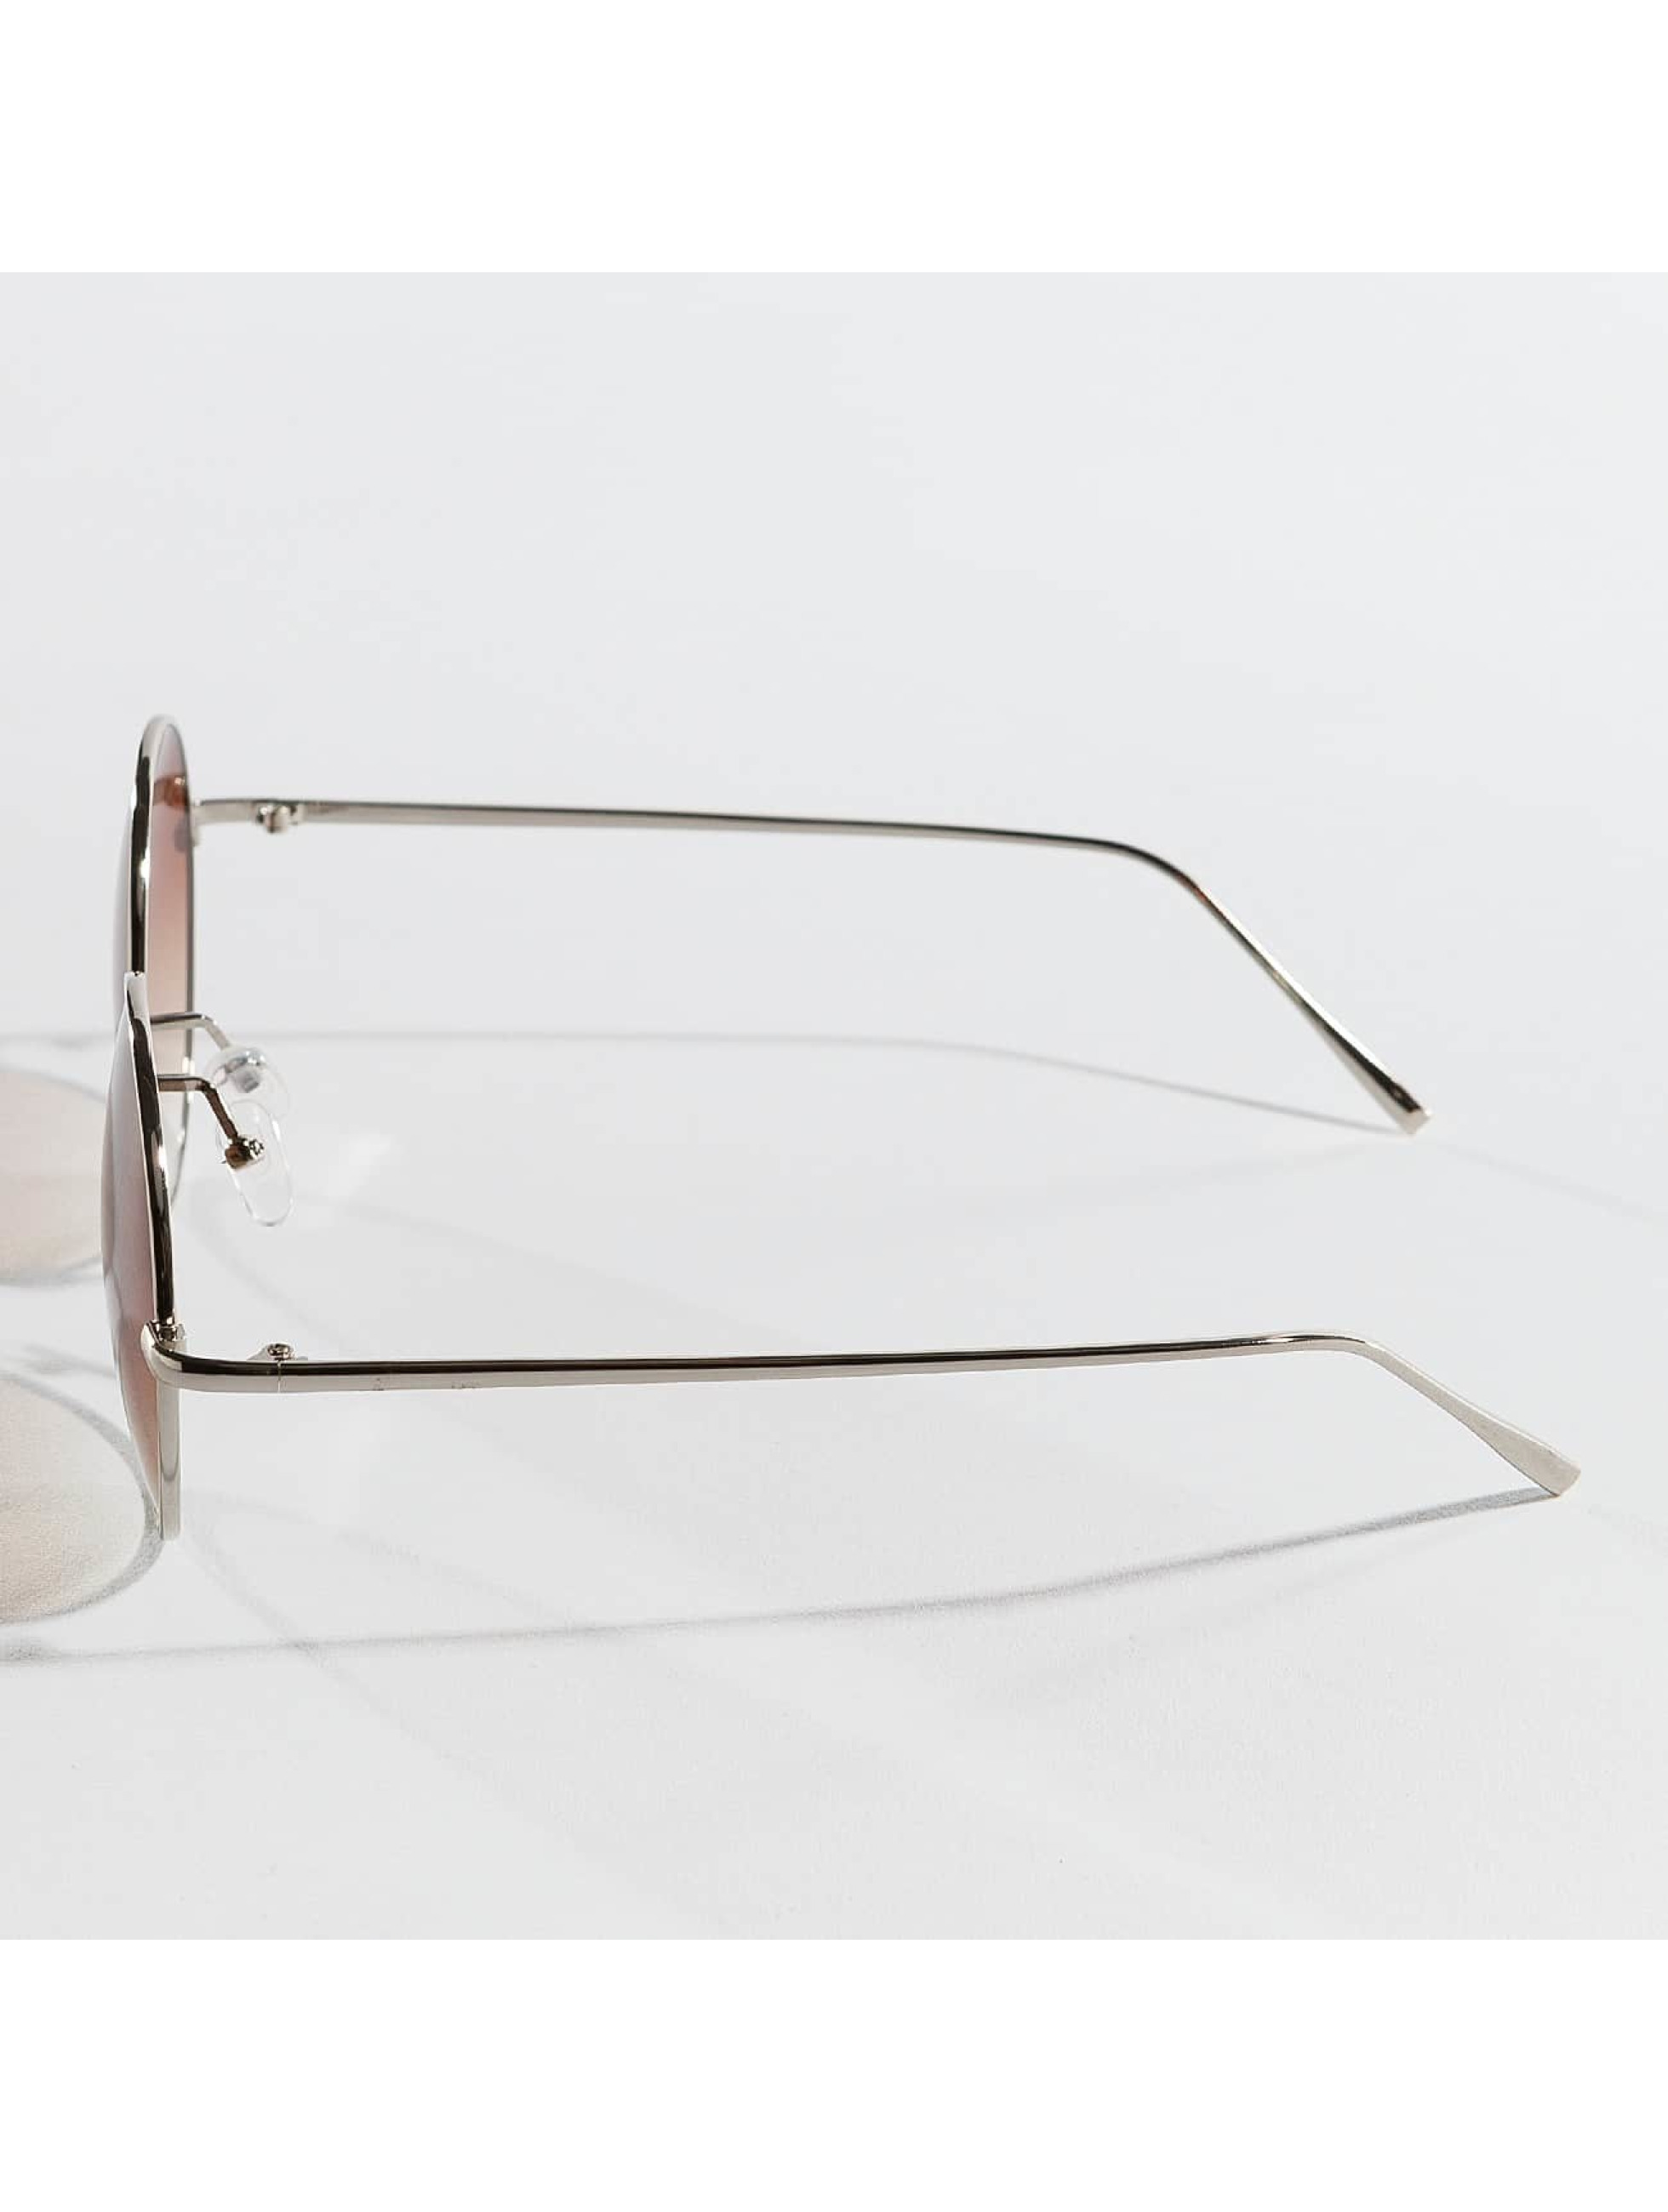 Hailys Sunglasses Luna silver